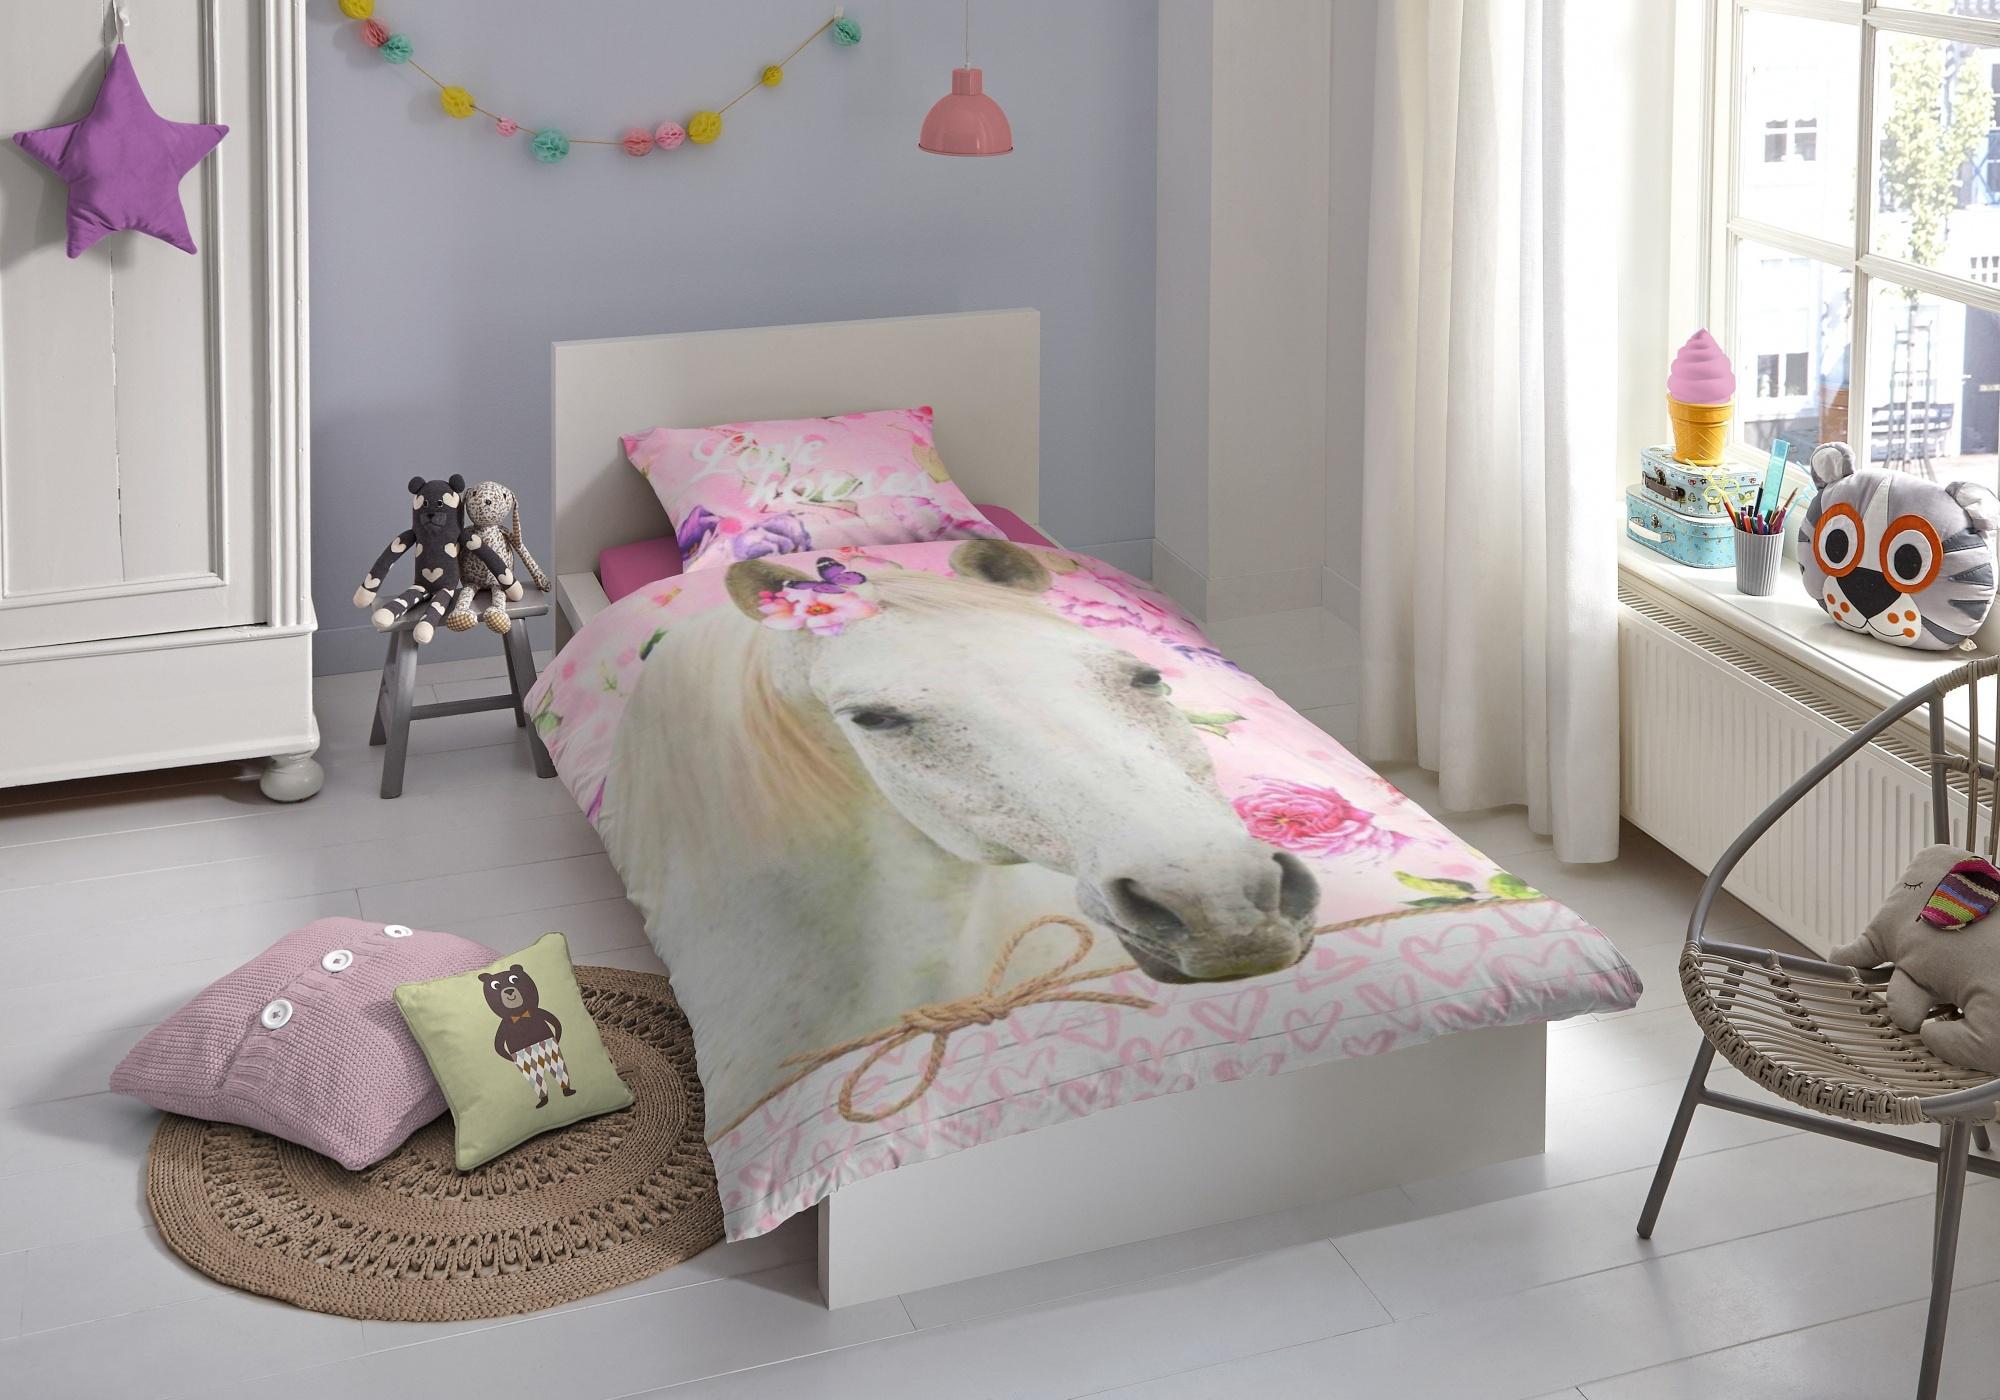 Good Morning dekbedovertrek Paard 140 x 200 220 cm roze